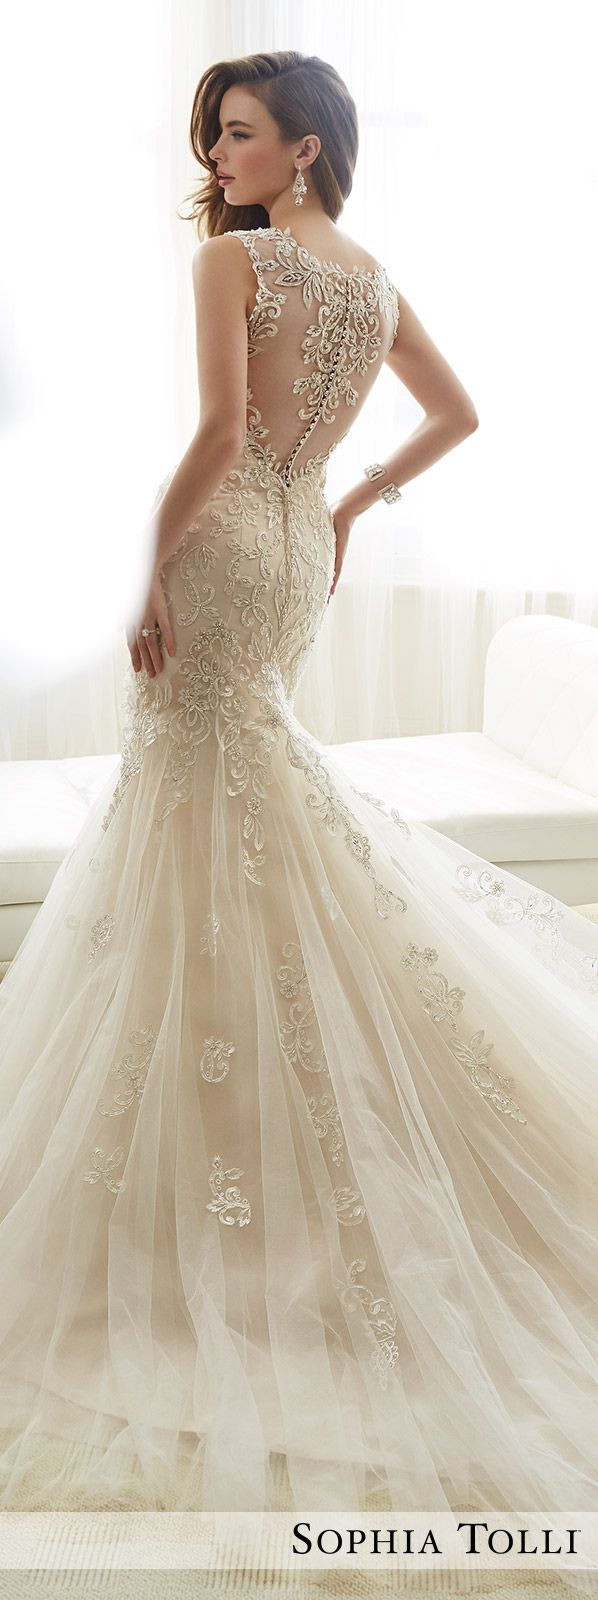 1000 ideas about fairytale dress on pinterest vintage for Mon amie wedding dresses